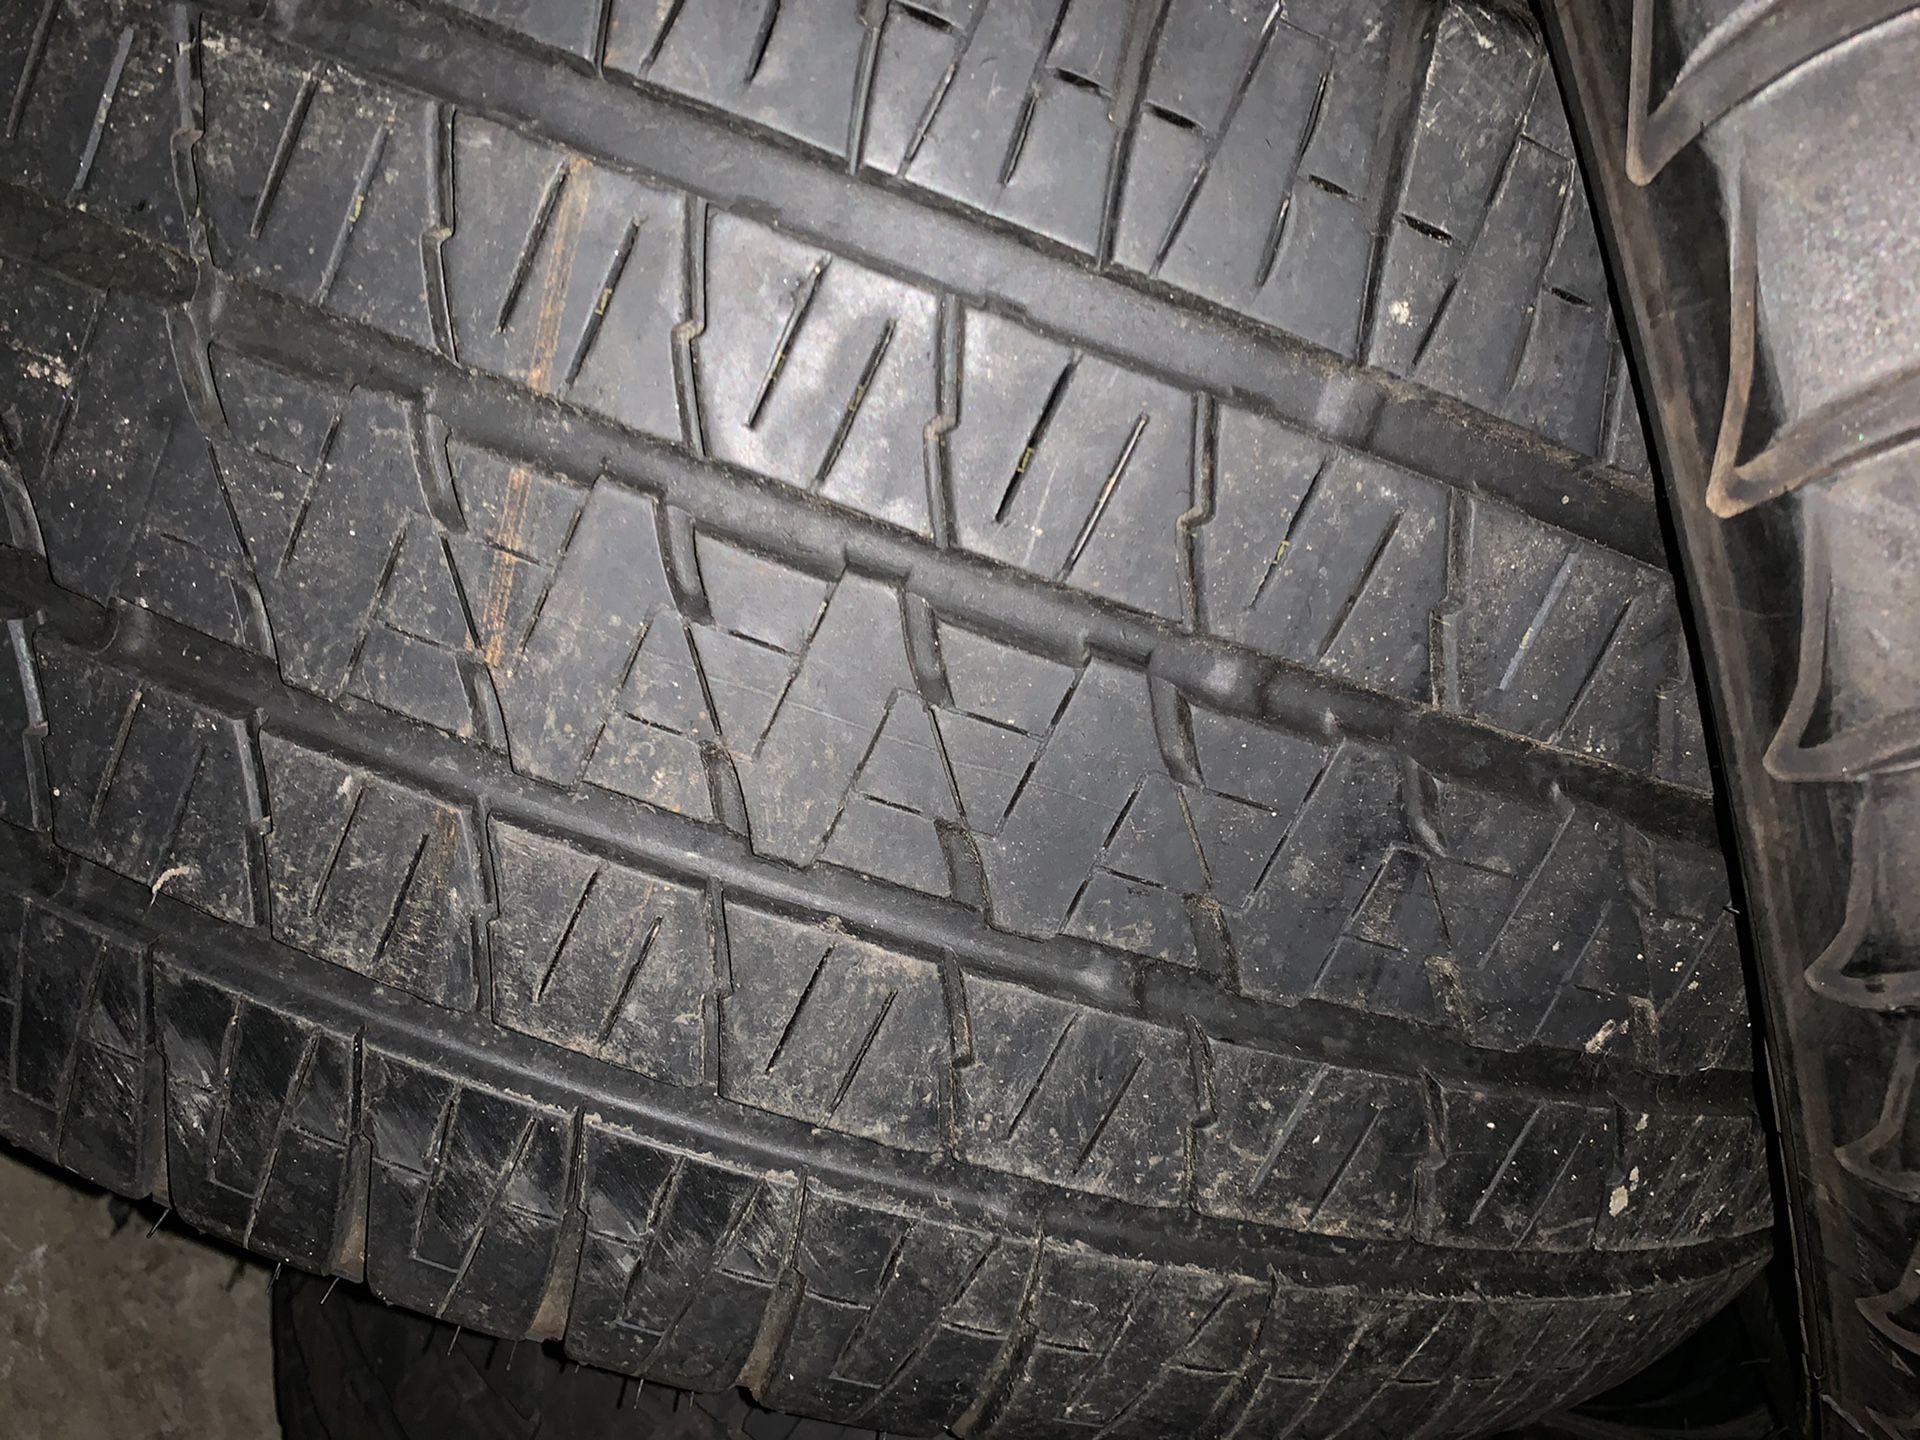 285/45/22 Bridgestone